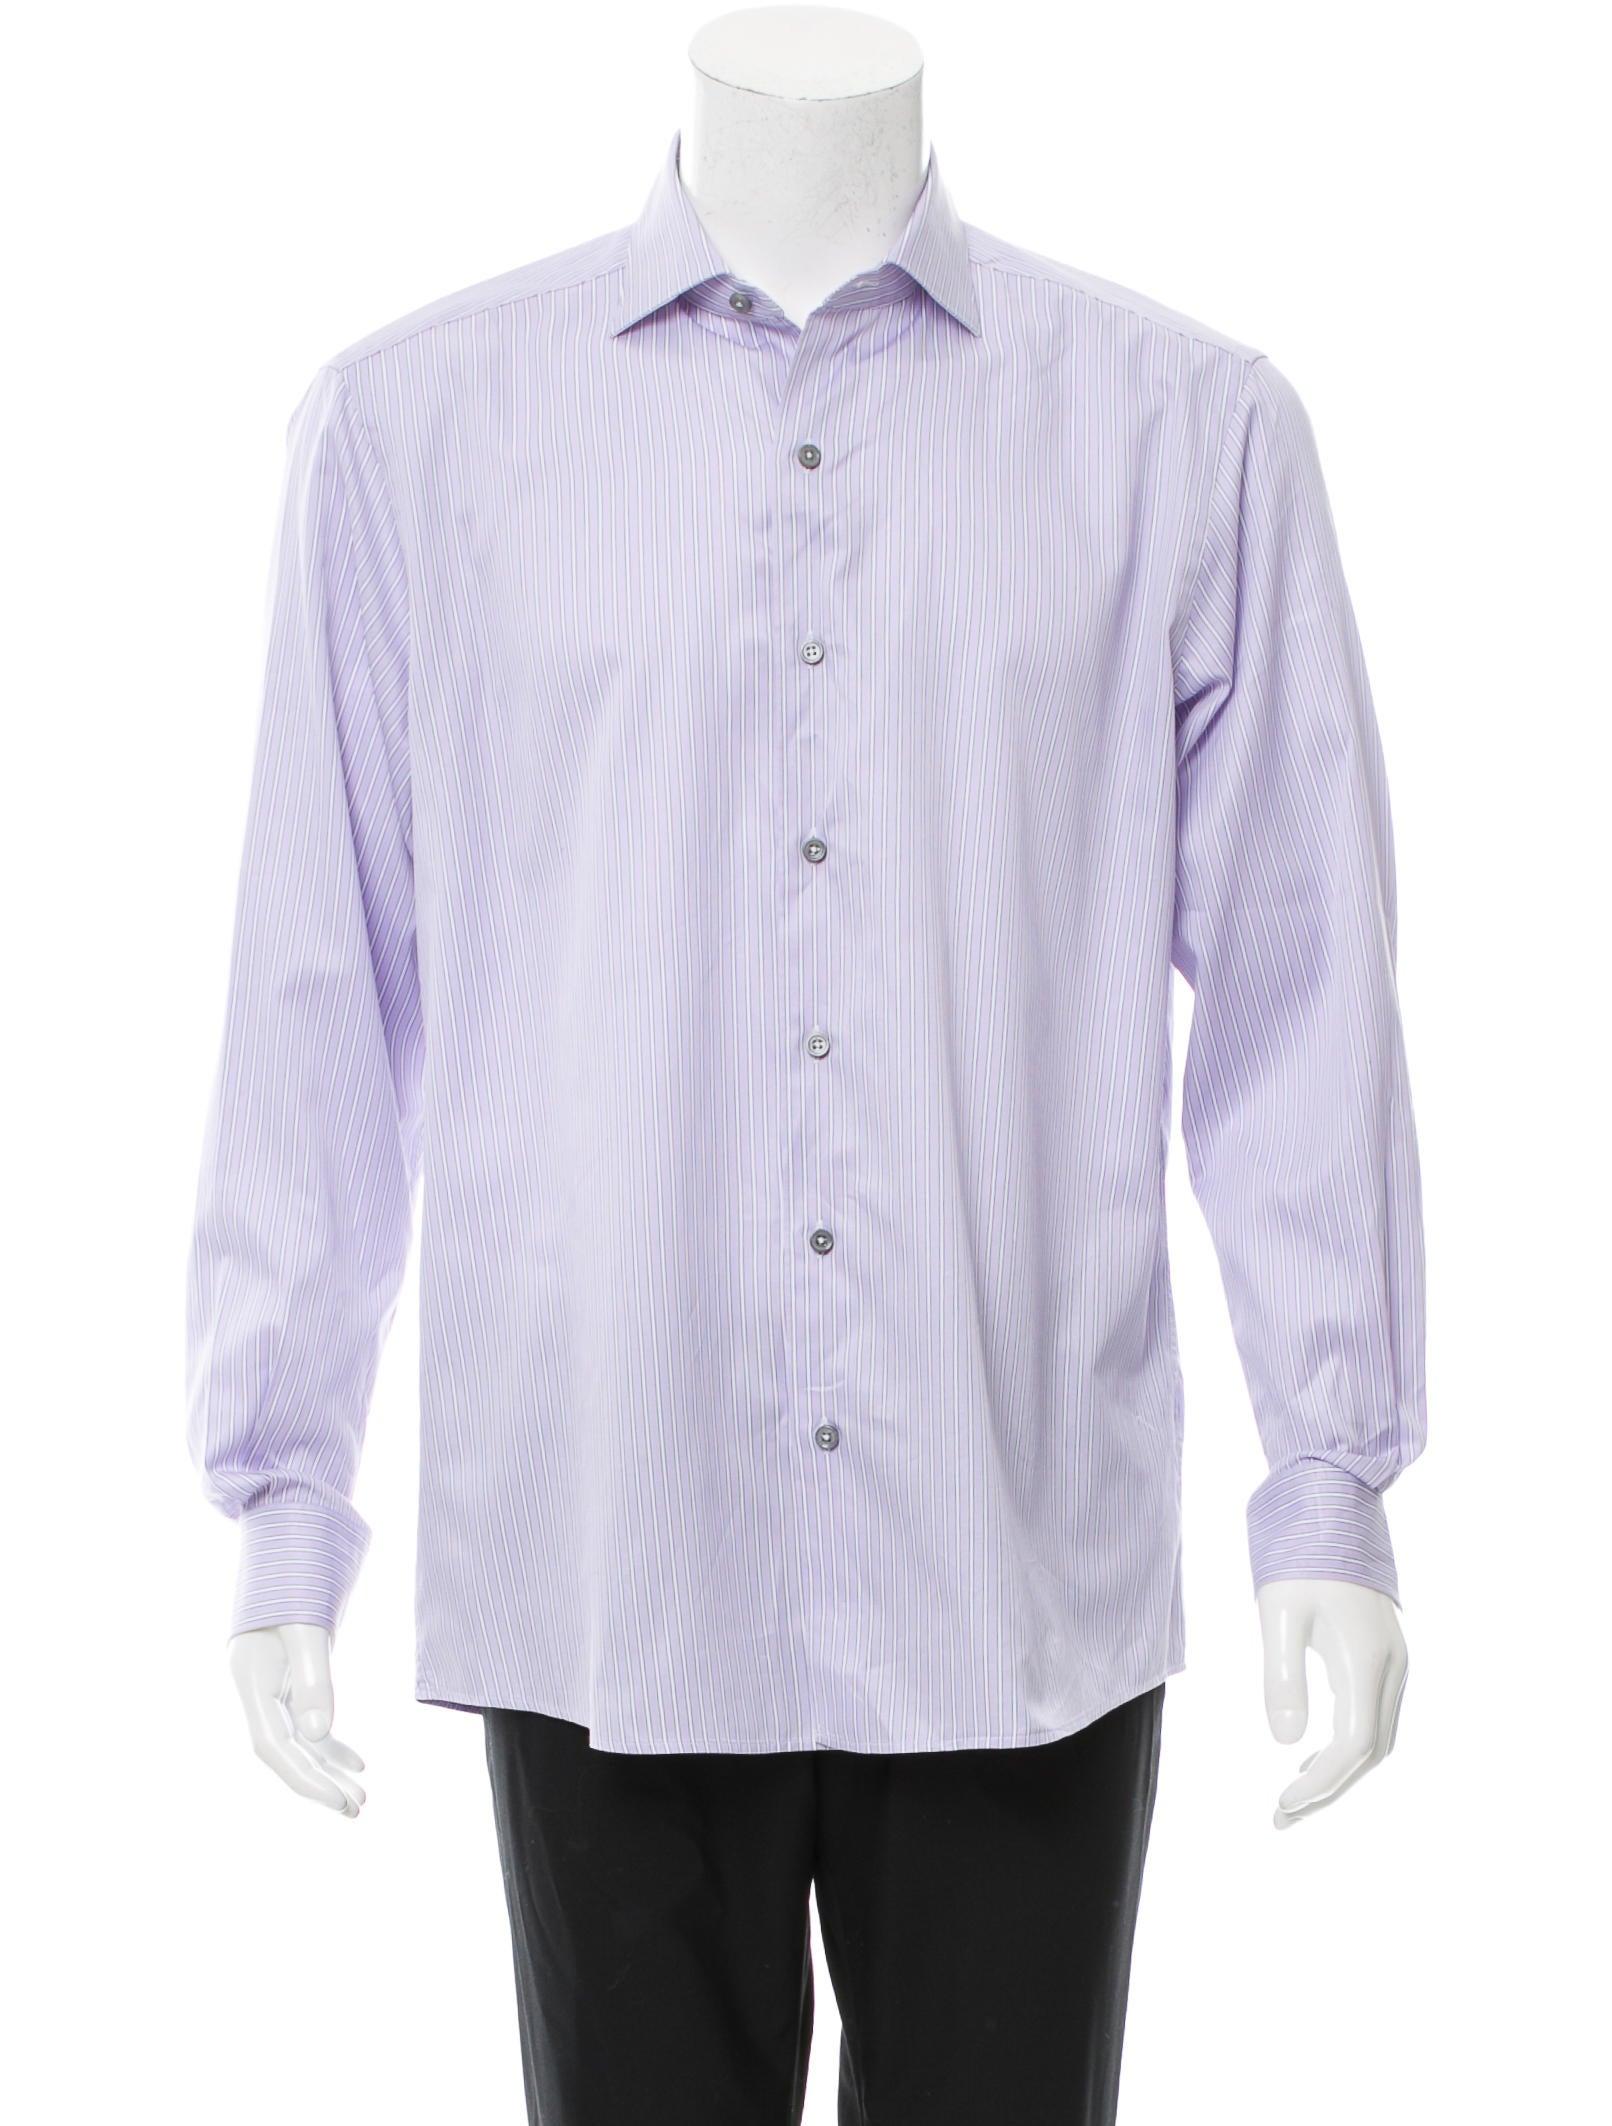 ermenegildo zegna striped button up shirt clothing zgn24246 the realreal. Black Bedroom Furniture Sets. Home Design Ideas